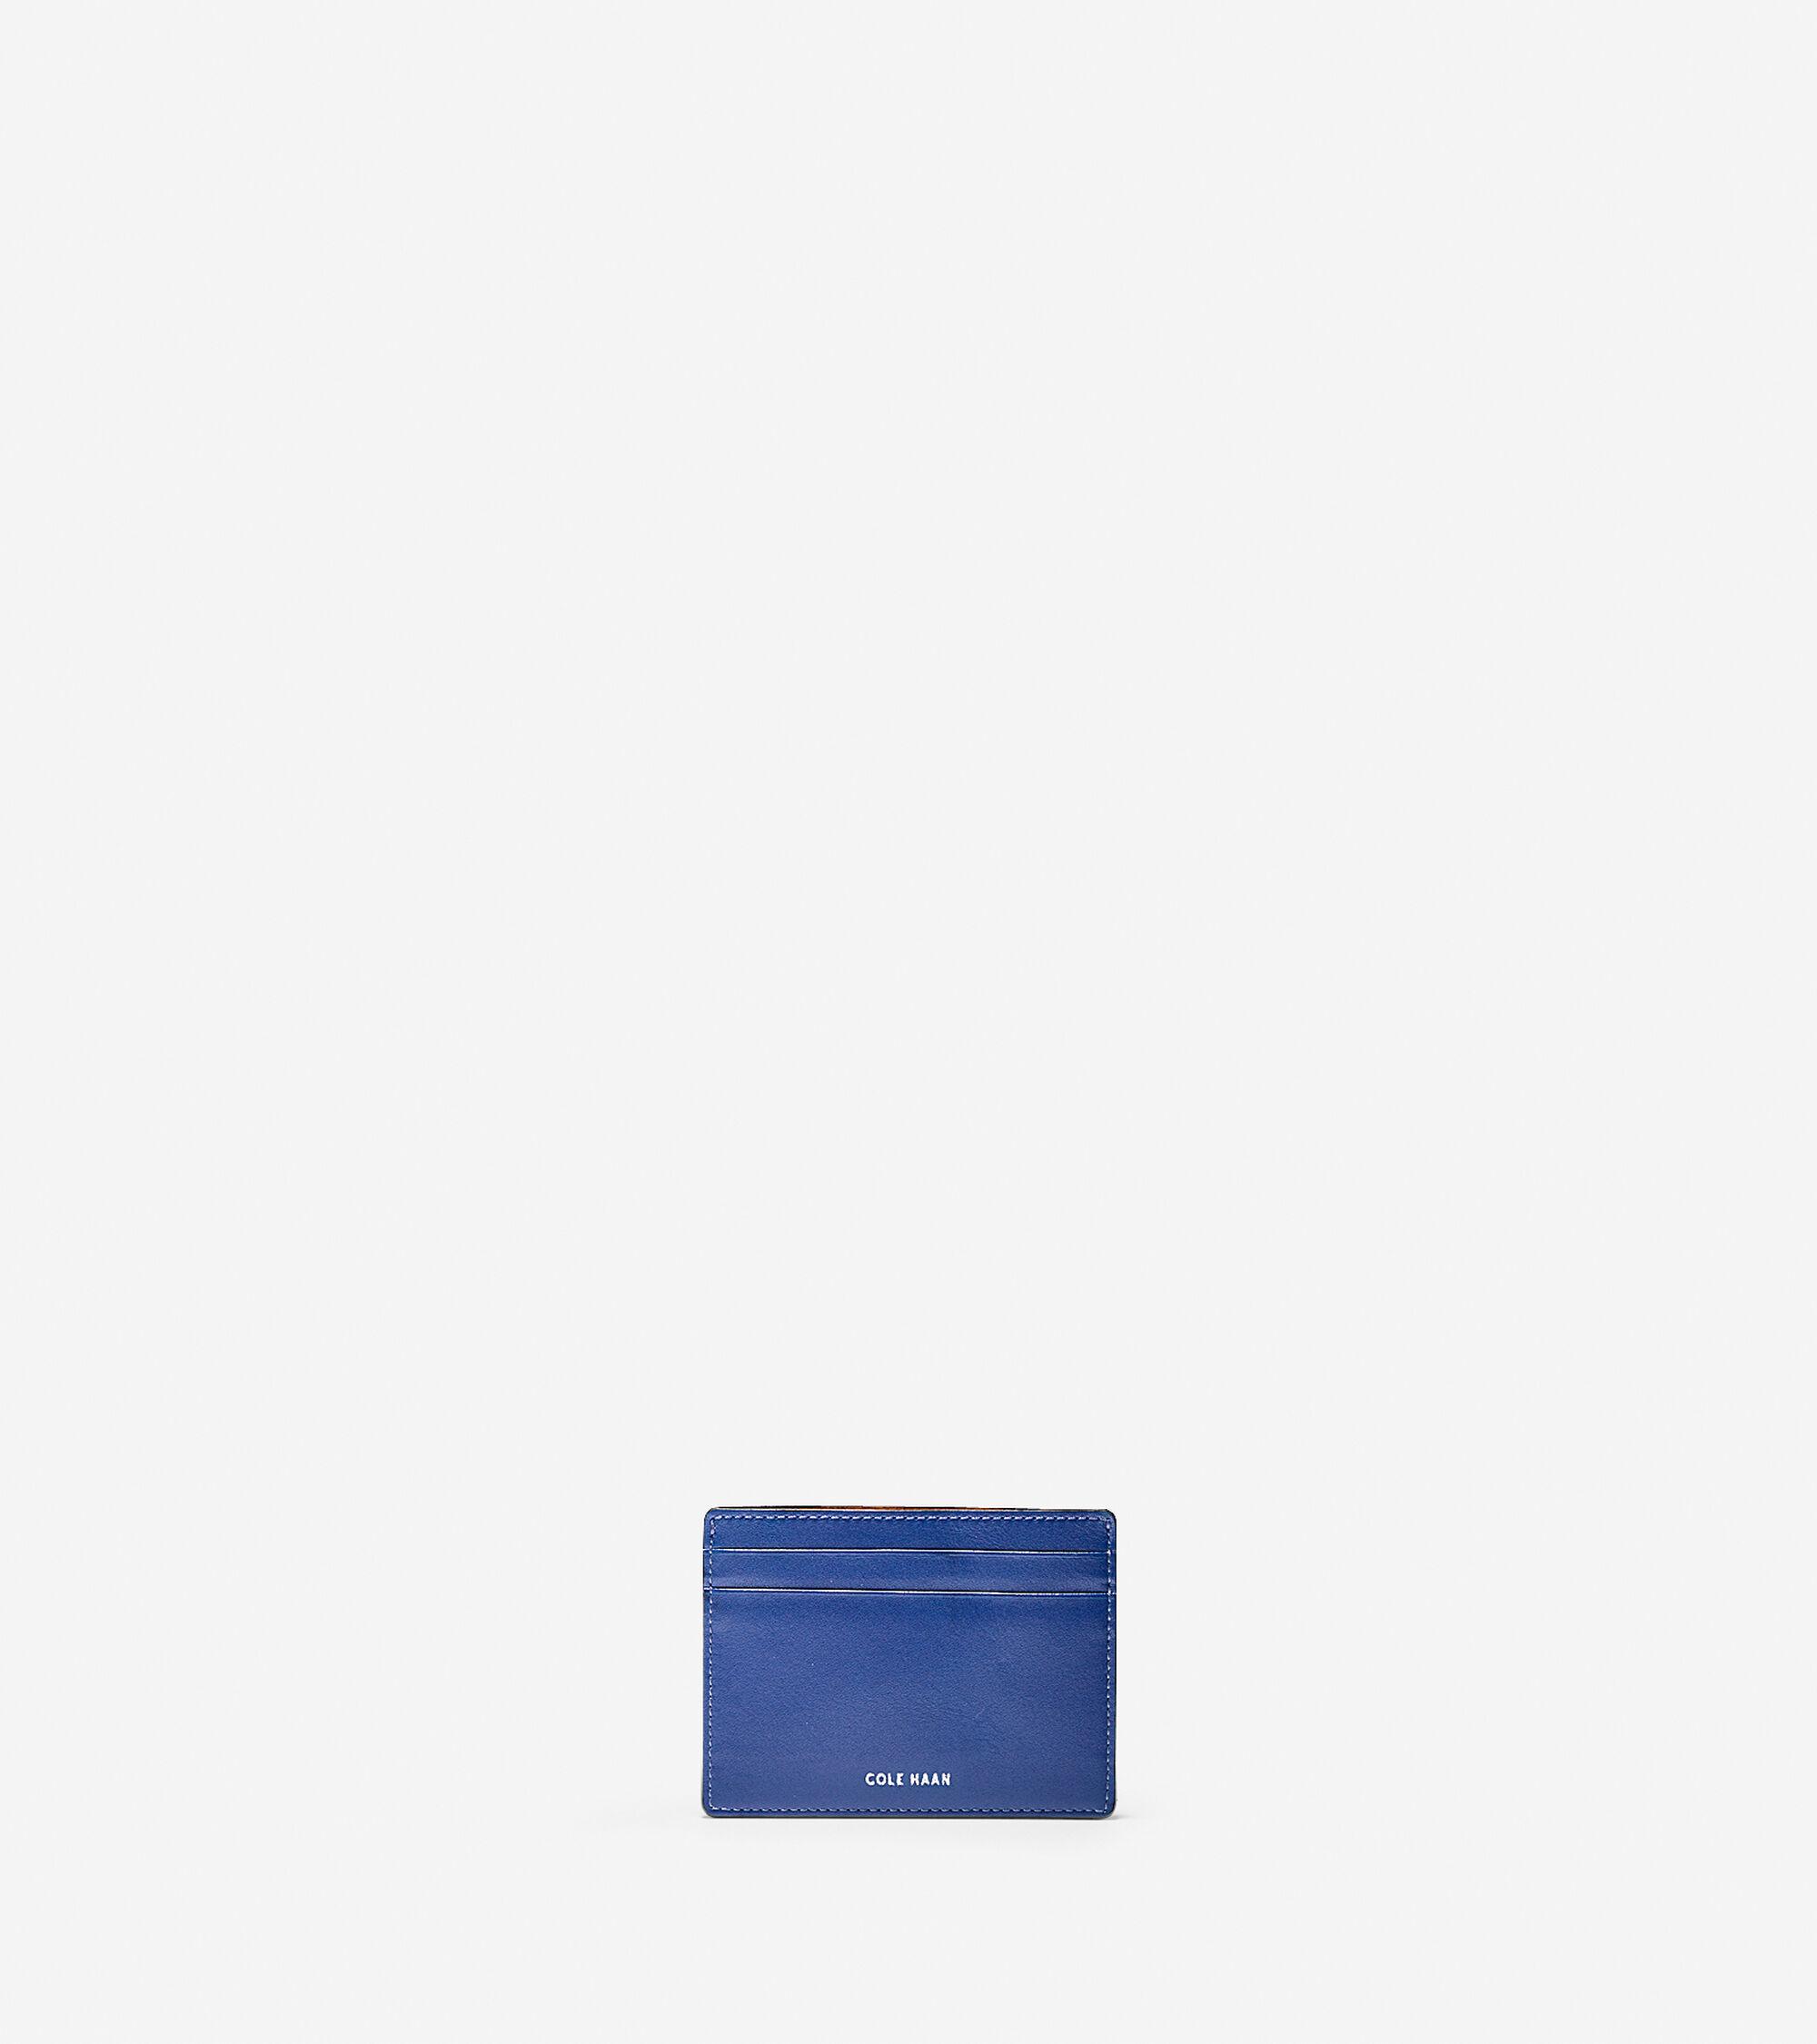 Accessories > Whitman Card Case